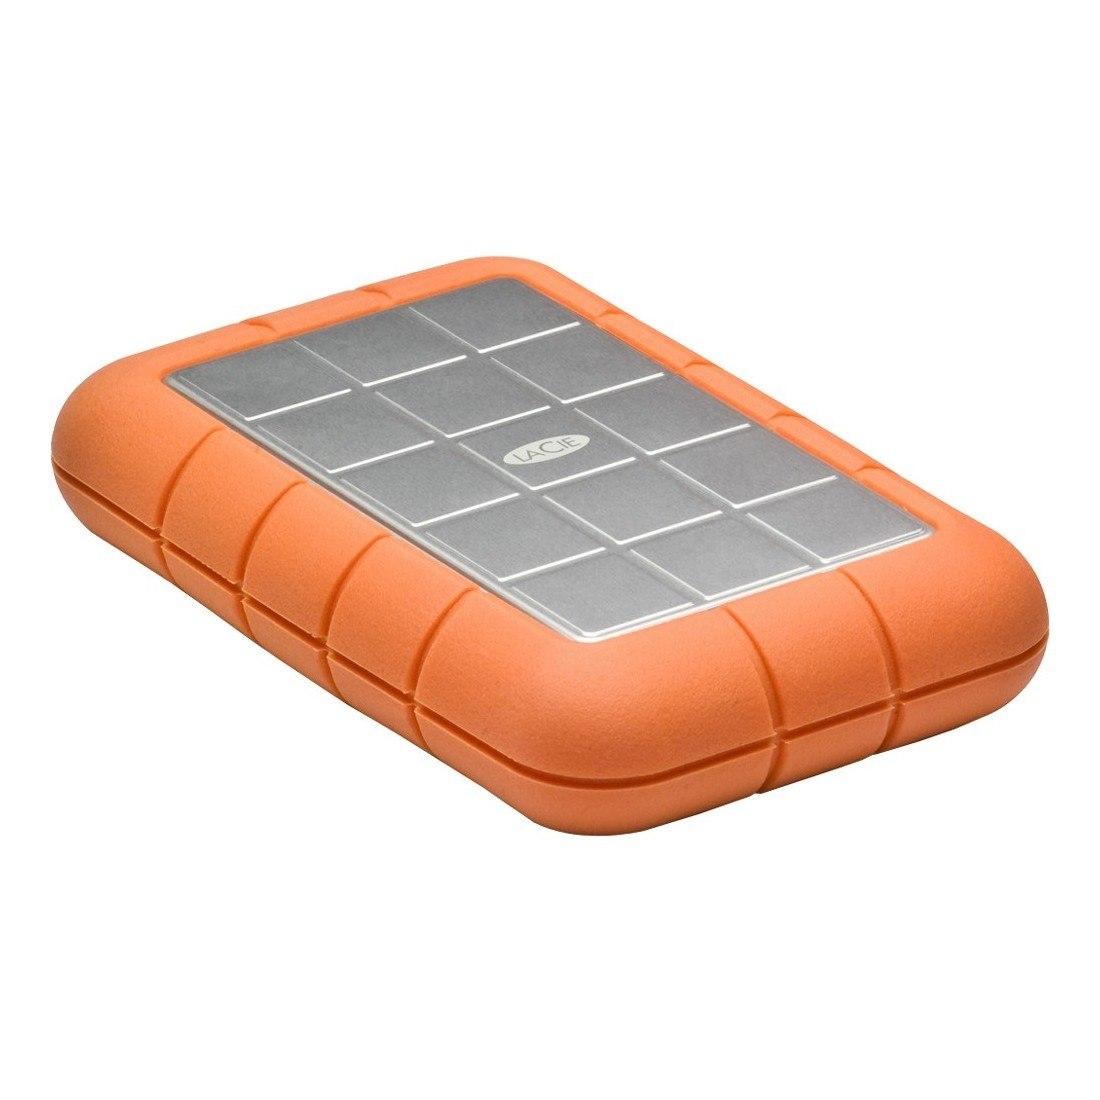 LaCie Rugged Triple 2 TB External Hard Drive - SATA - Portable